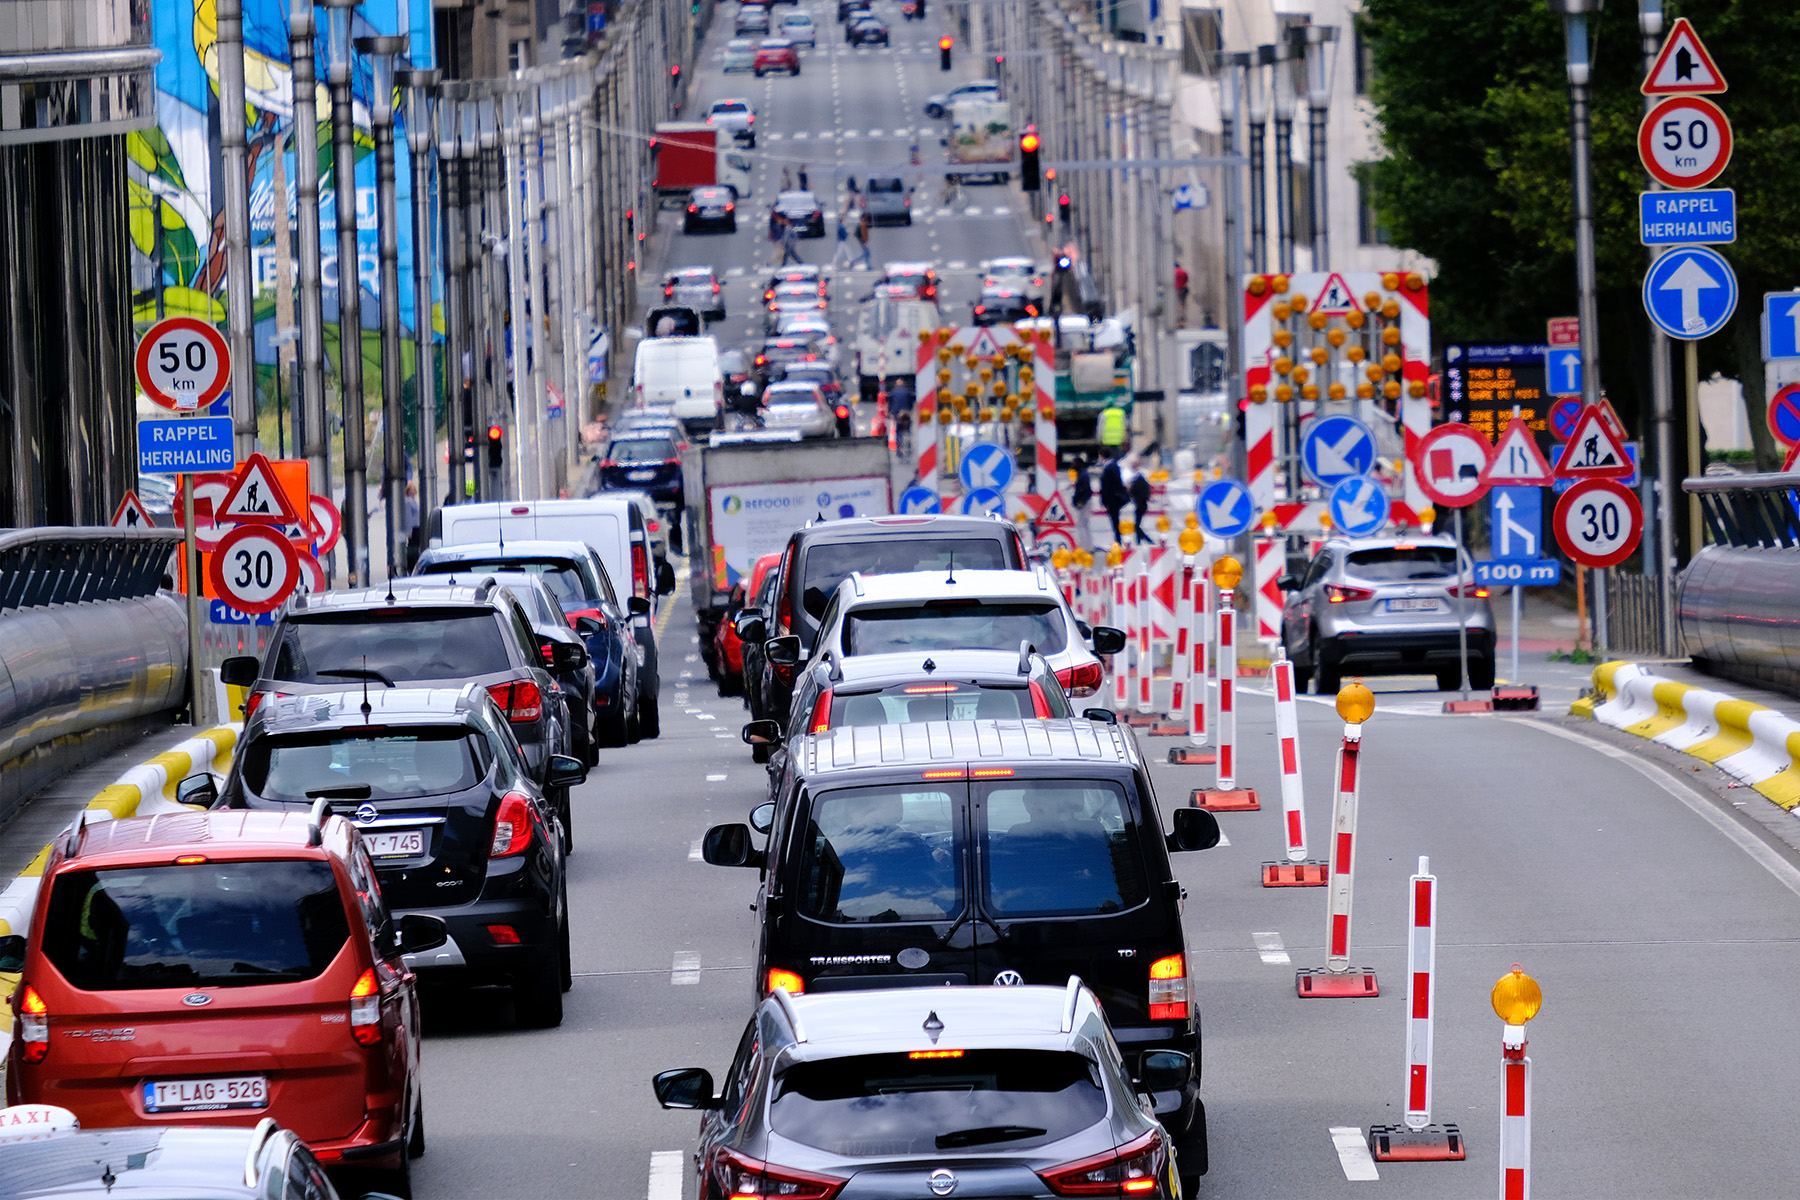 Traffic jam in Brussels